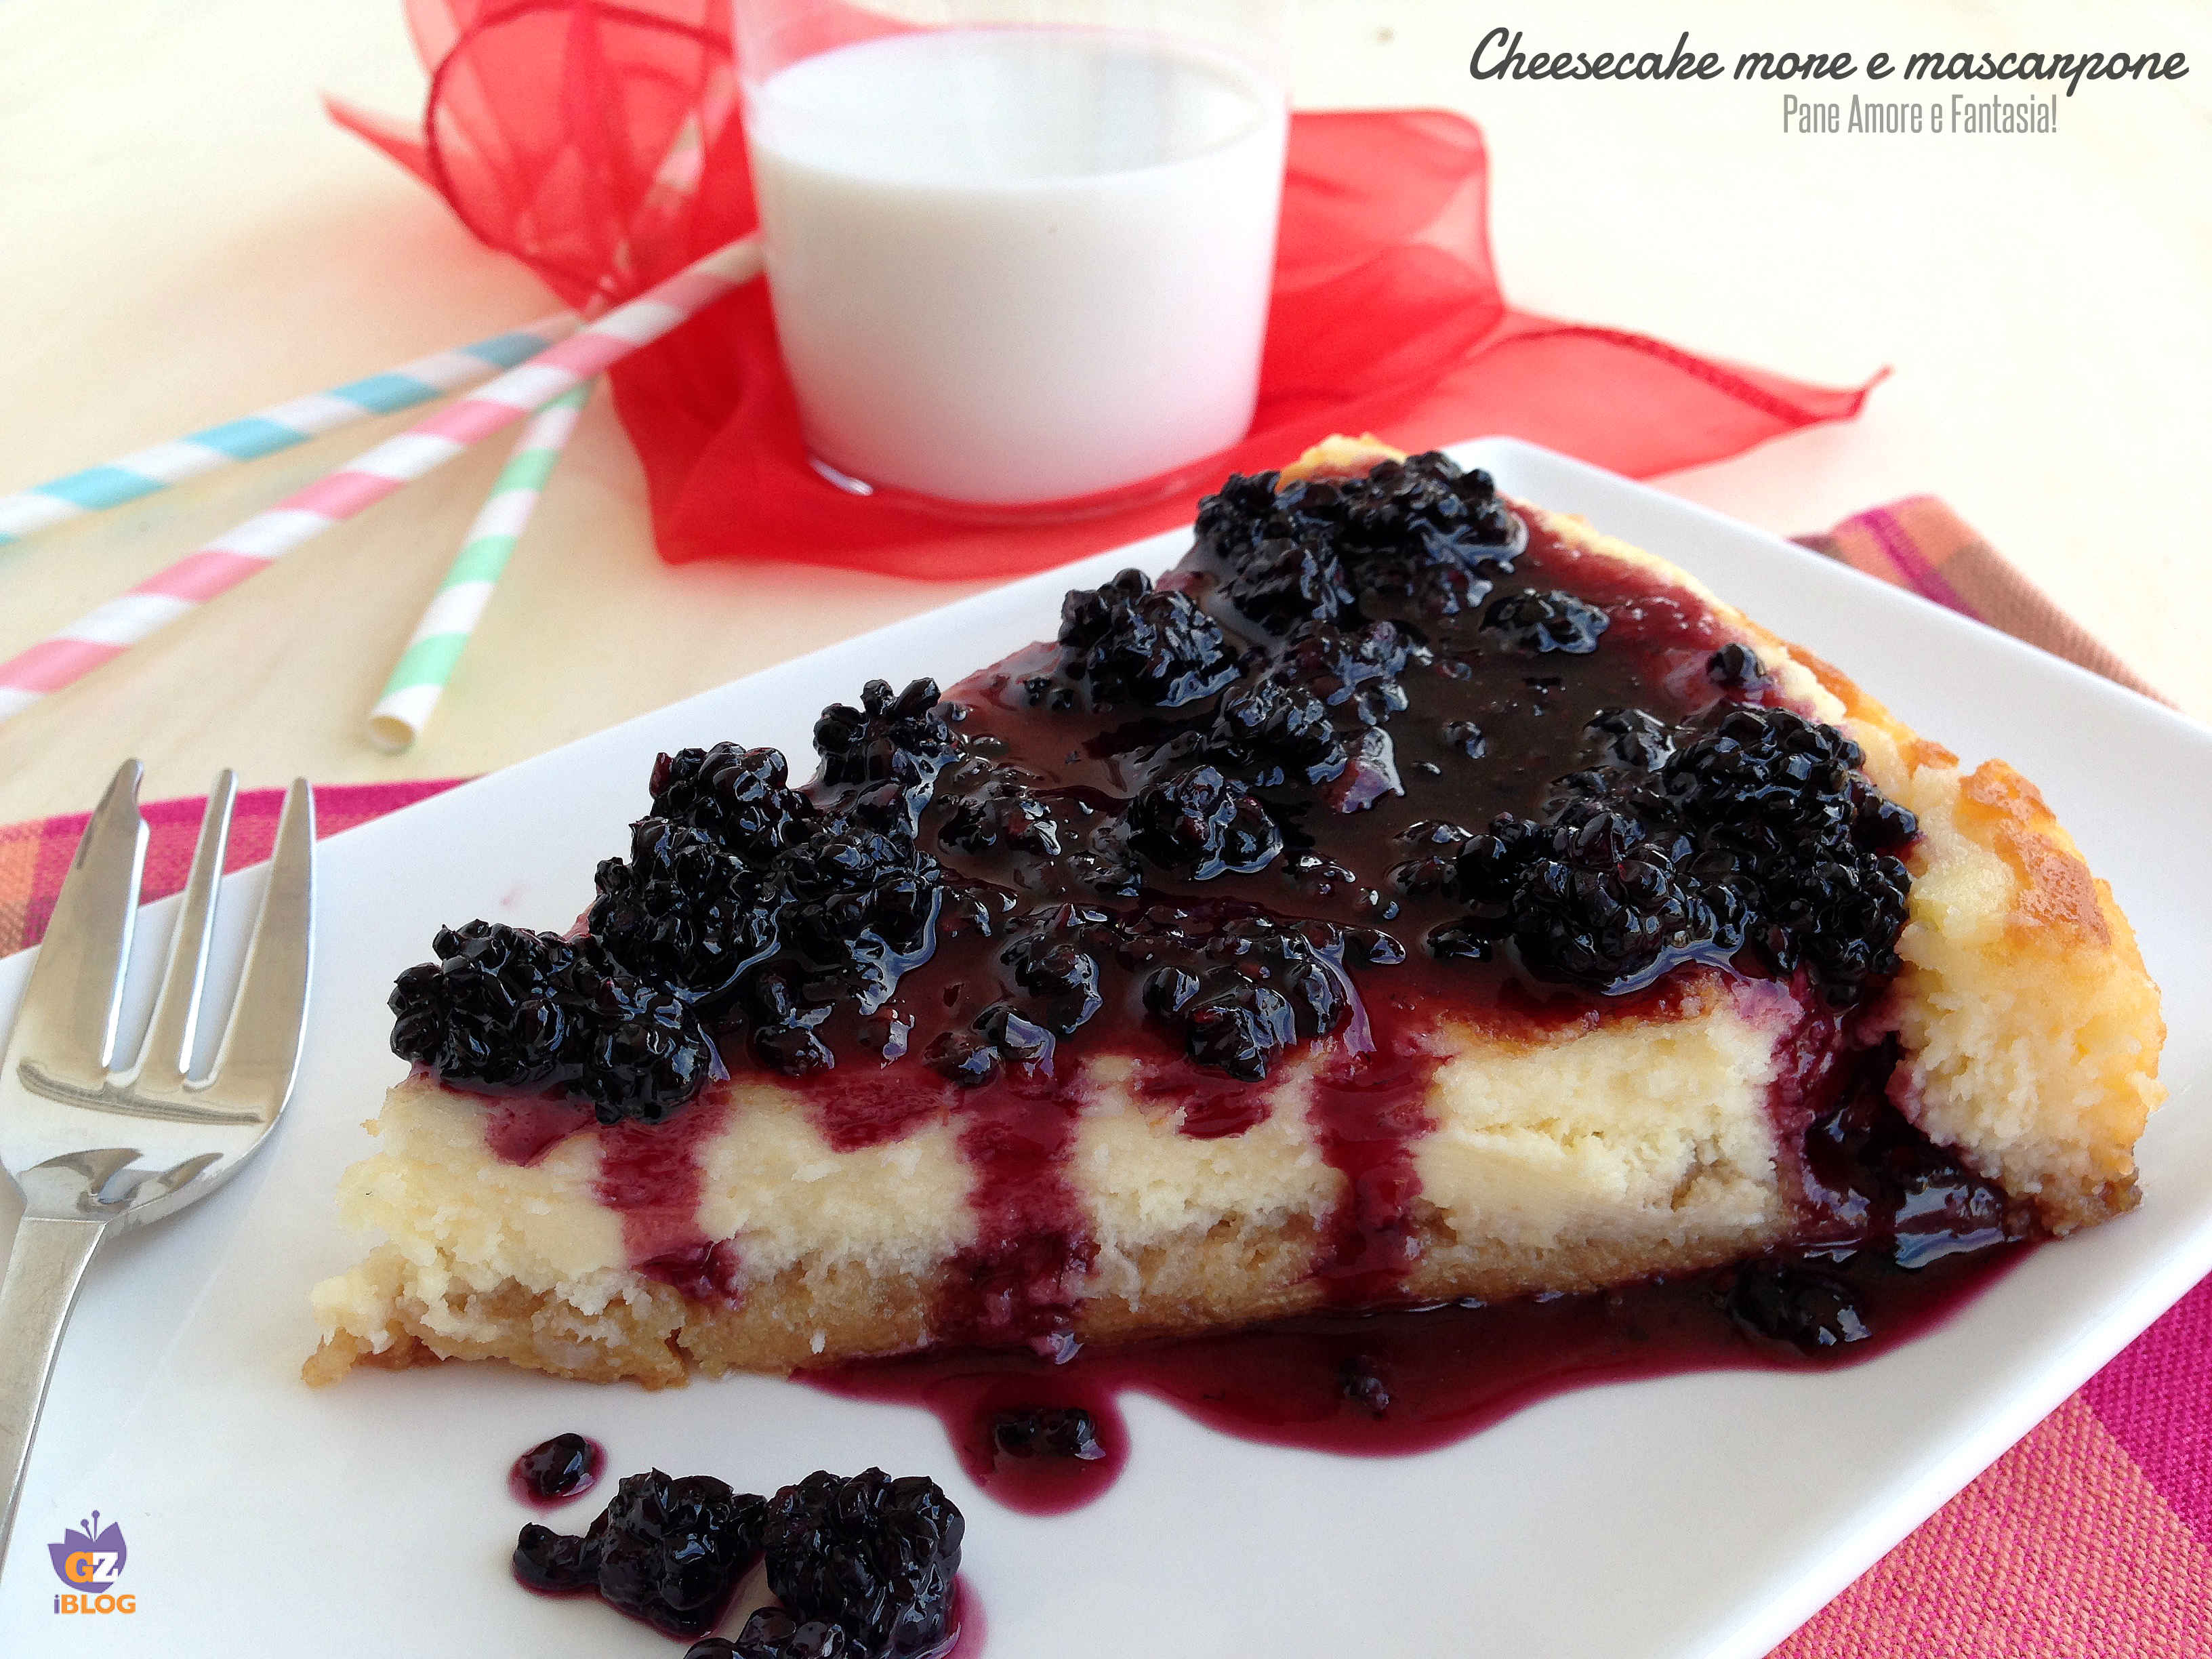 cheesecake more e mascarpone